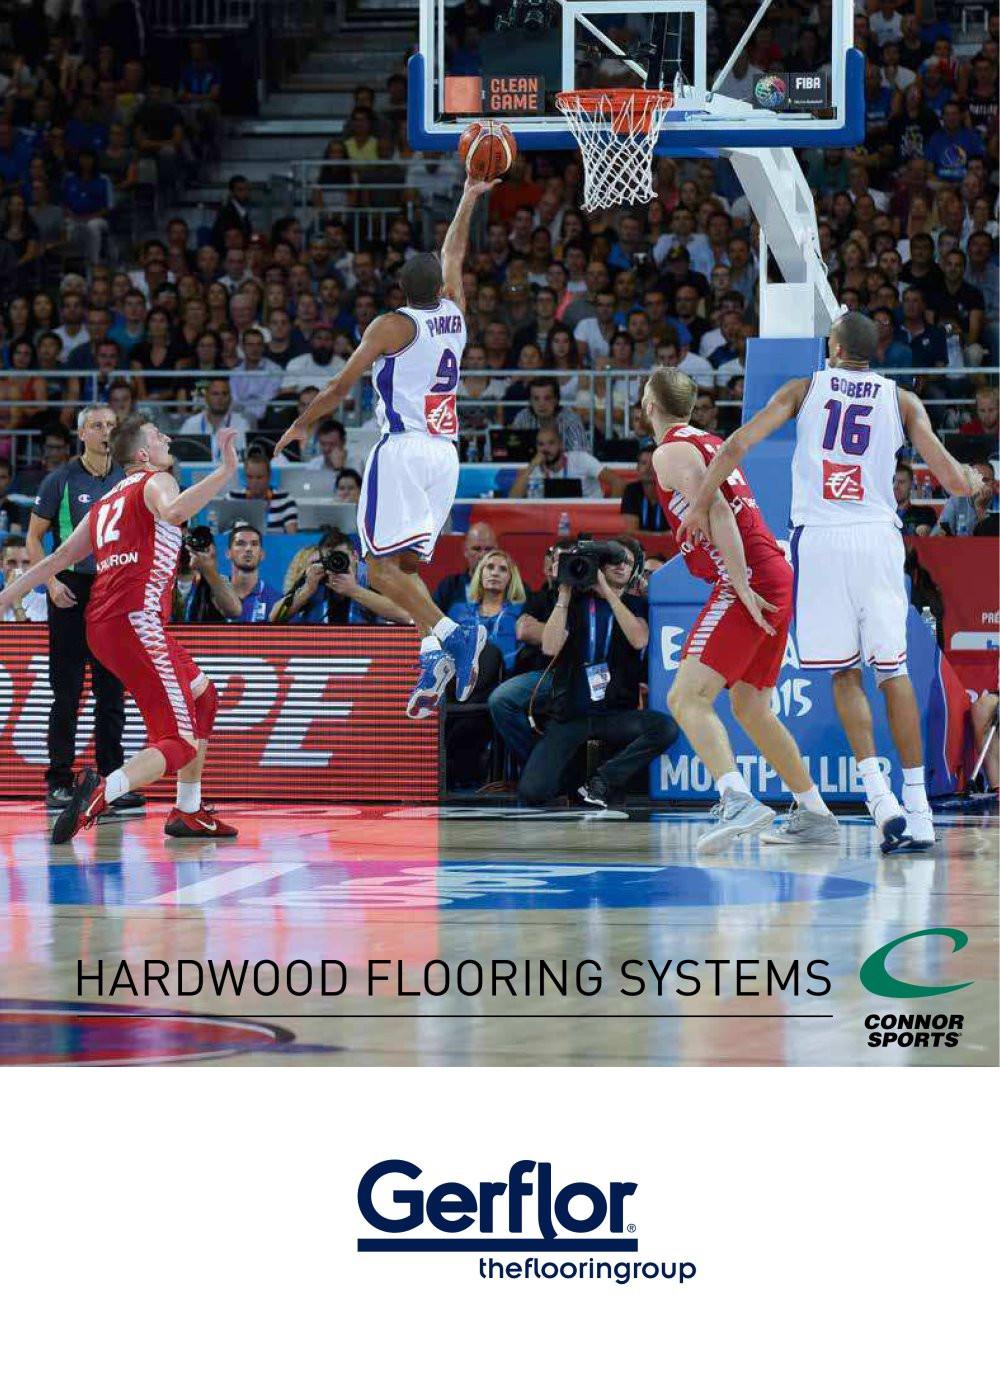 hardwood floor refinishing sacramento of hardwood flooring systems gerflor contract sport contract intended for hardwood flooring systems 1 12 pages